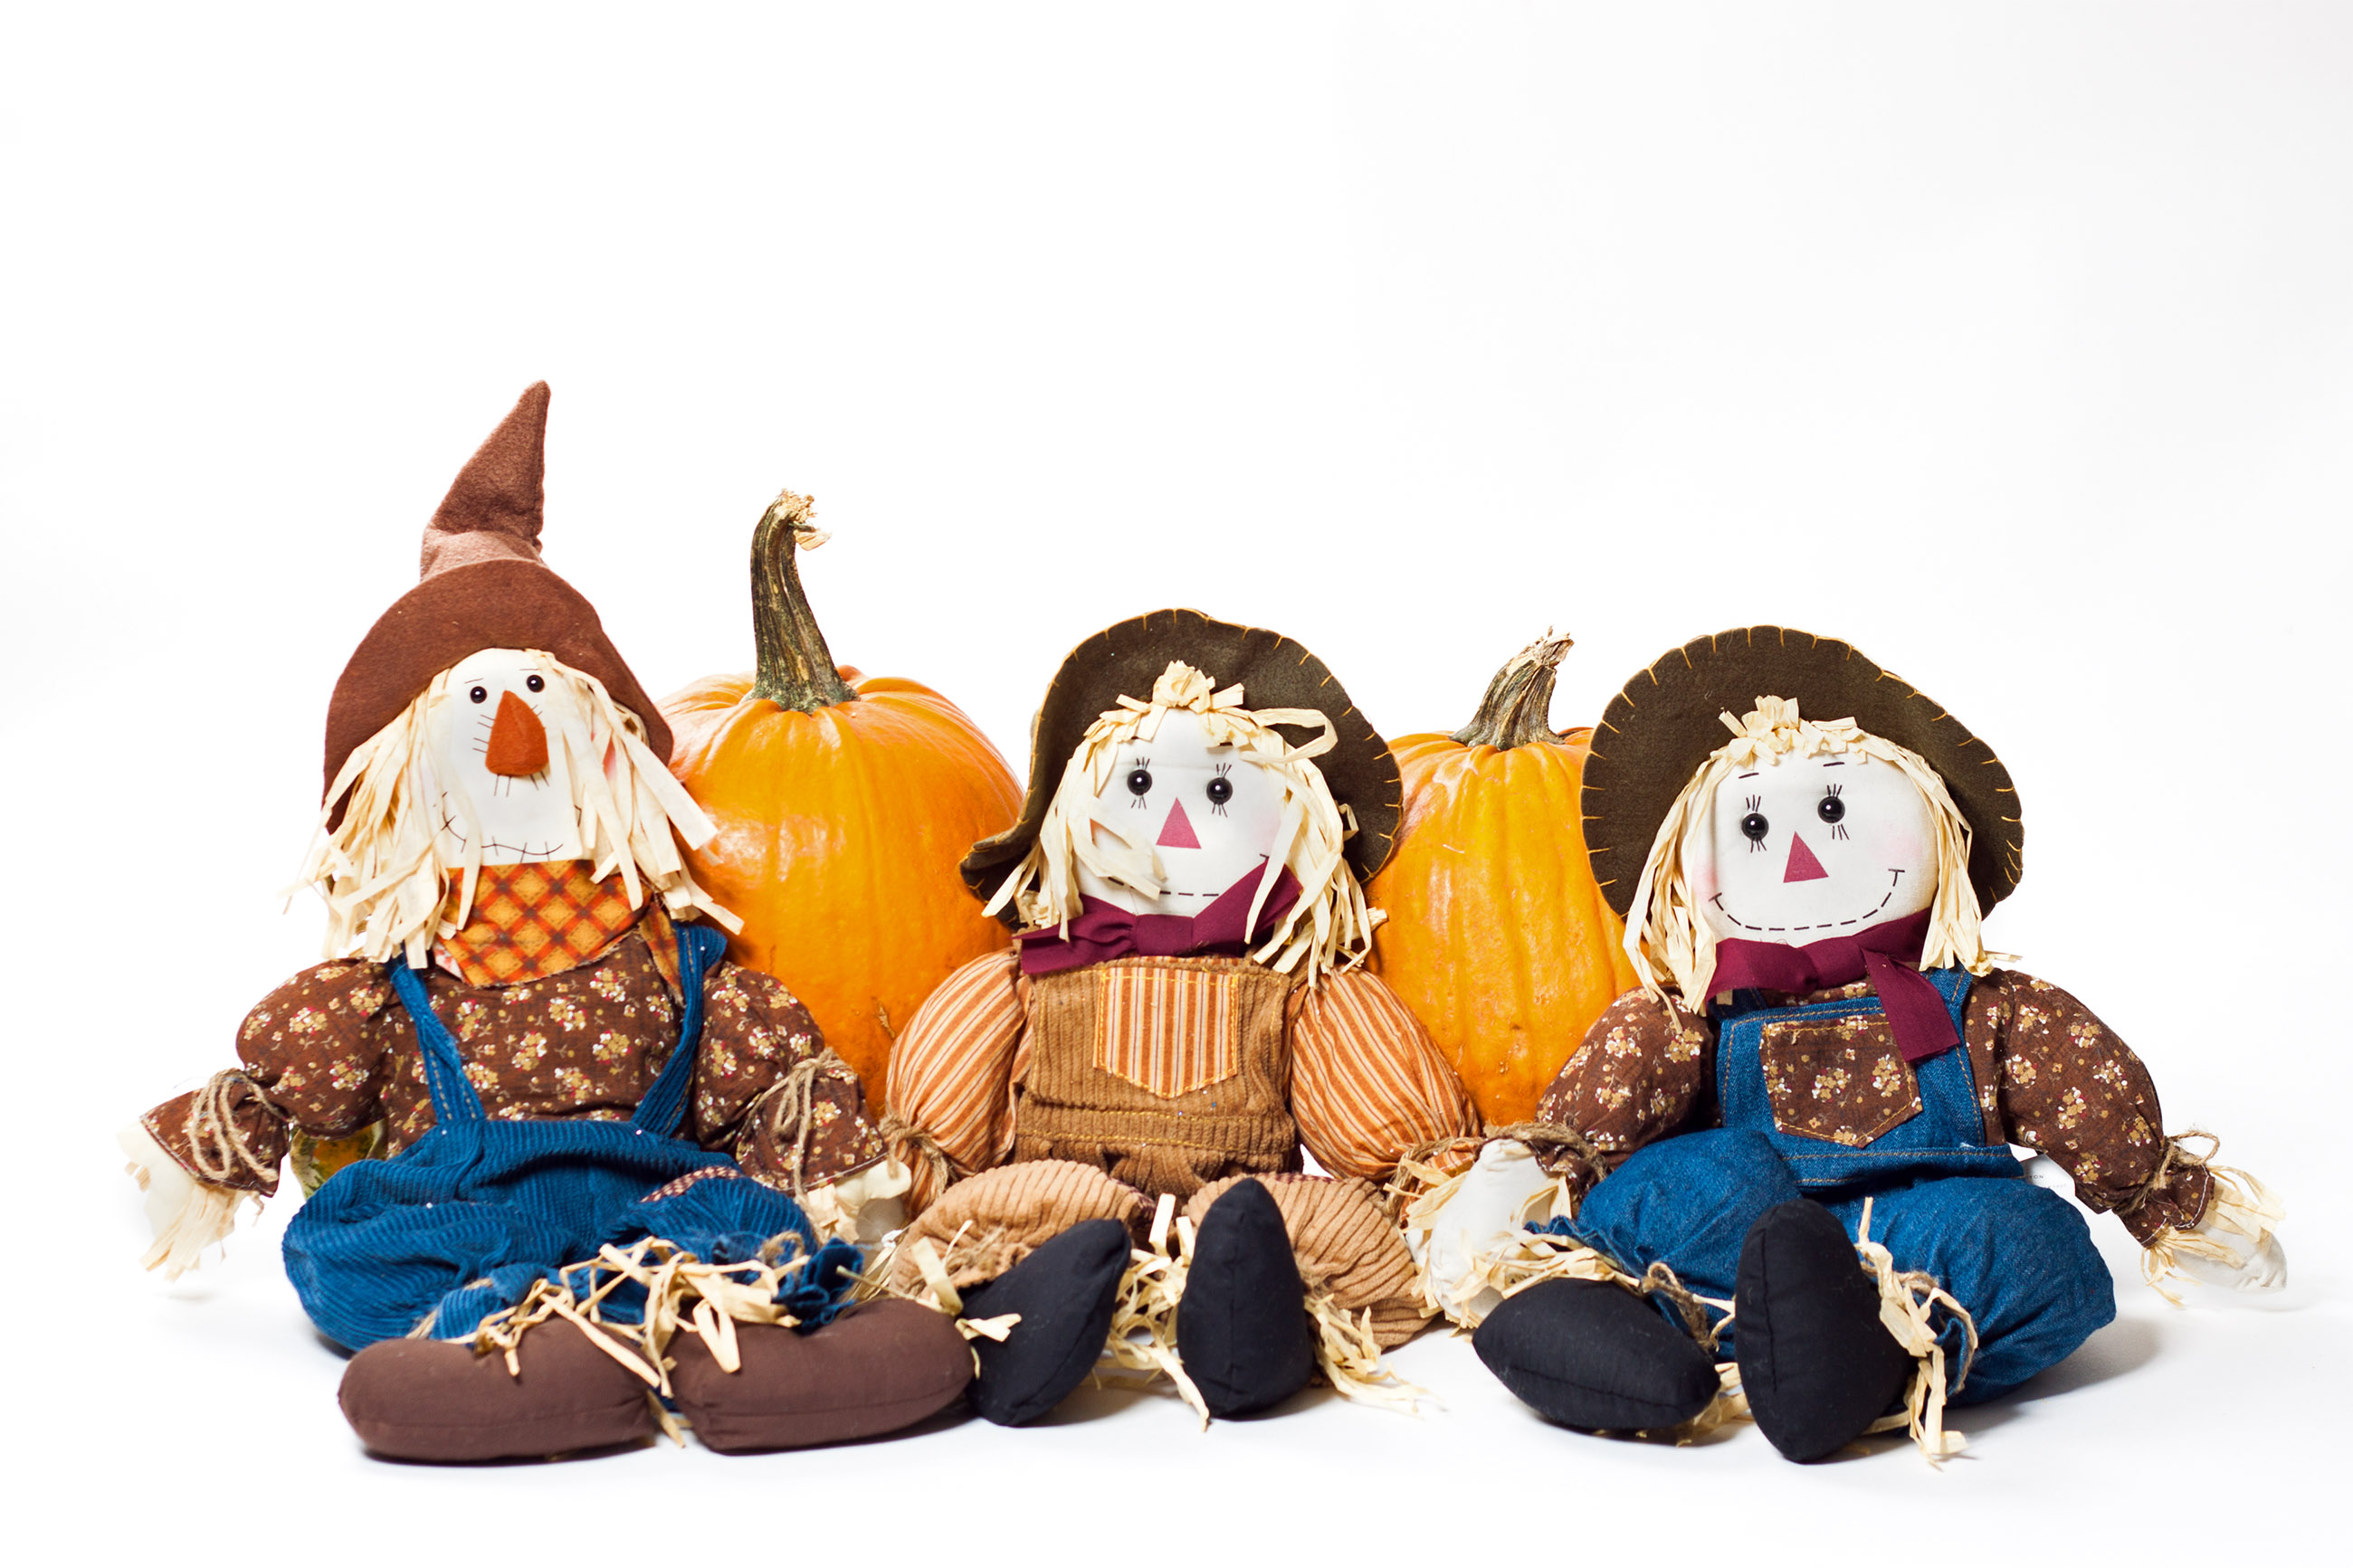 Autumn scarecrows, Autumn, Hay, Holiday, Husk, HQ Photo